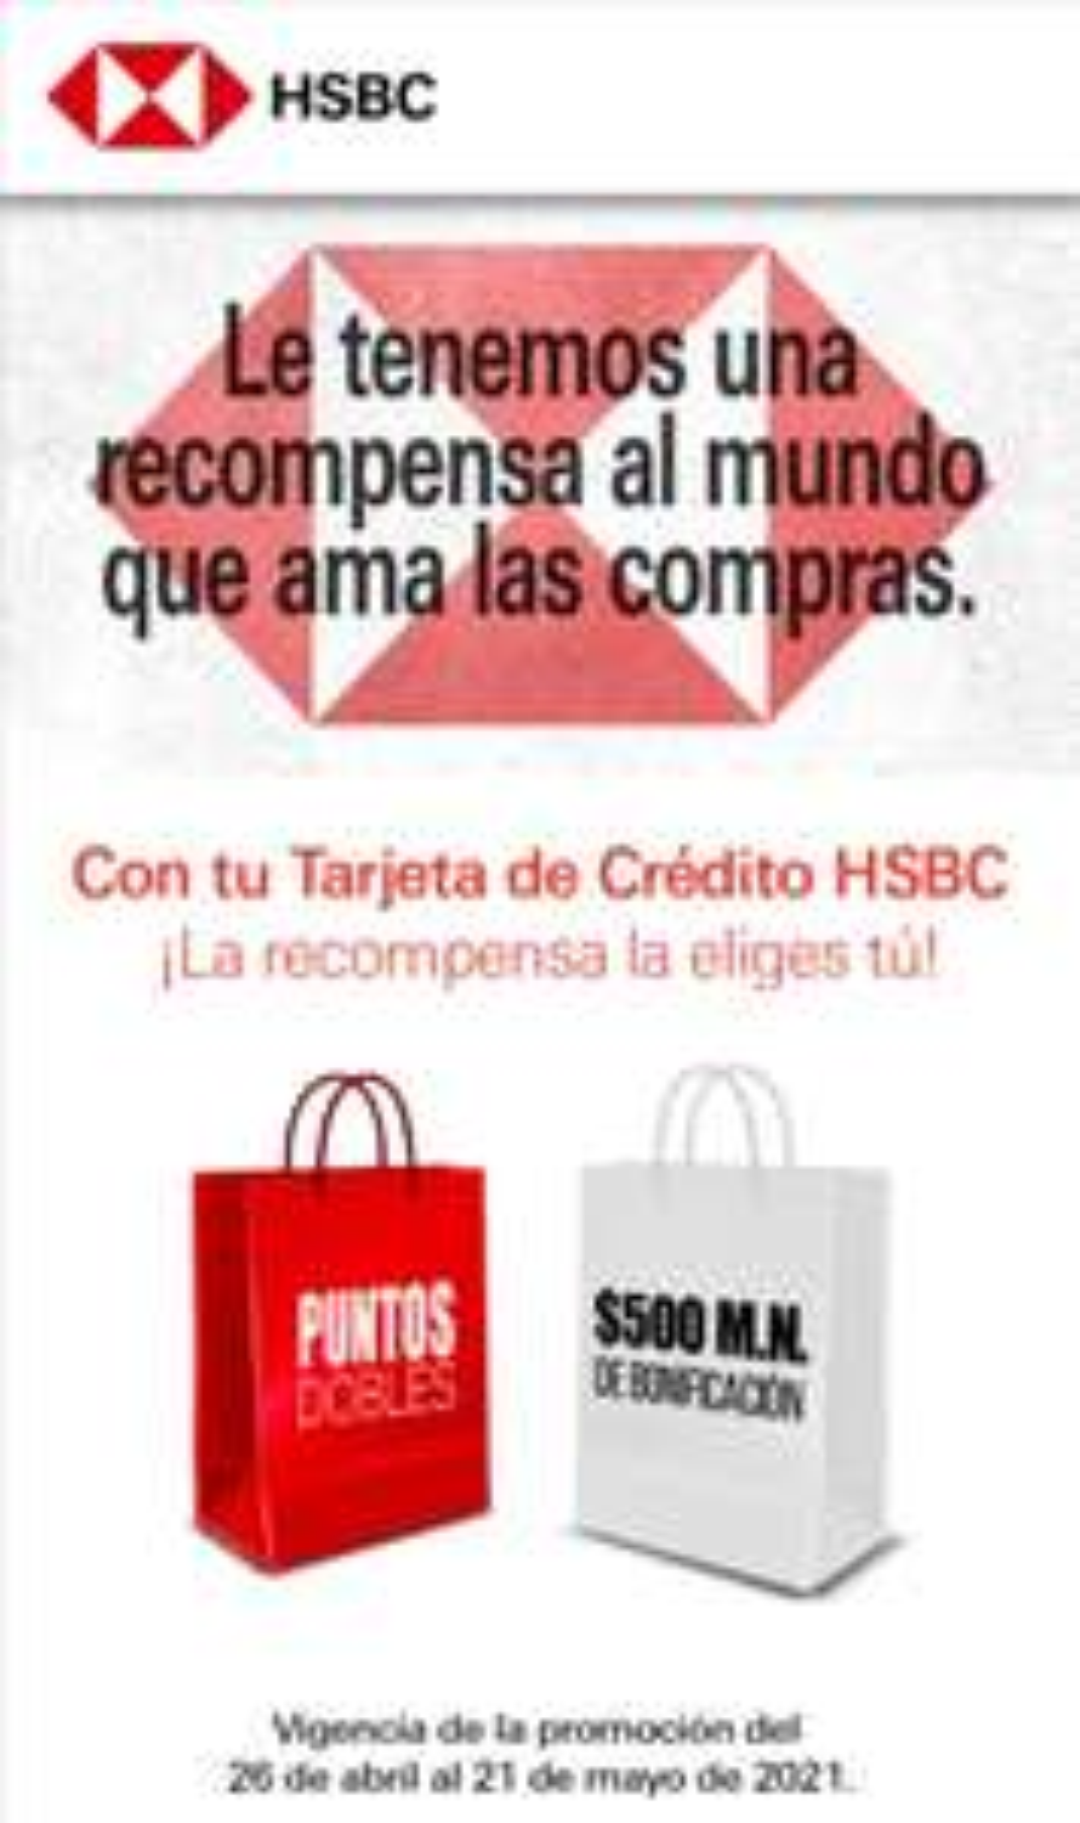 HSBC: Recompensa de $500 o puntos dobles programa Mas